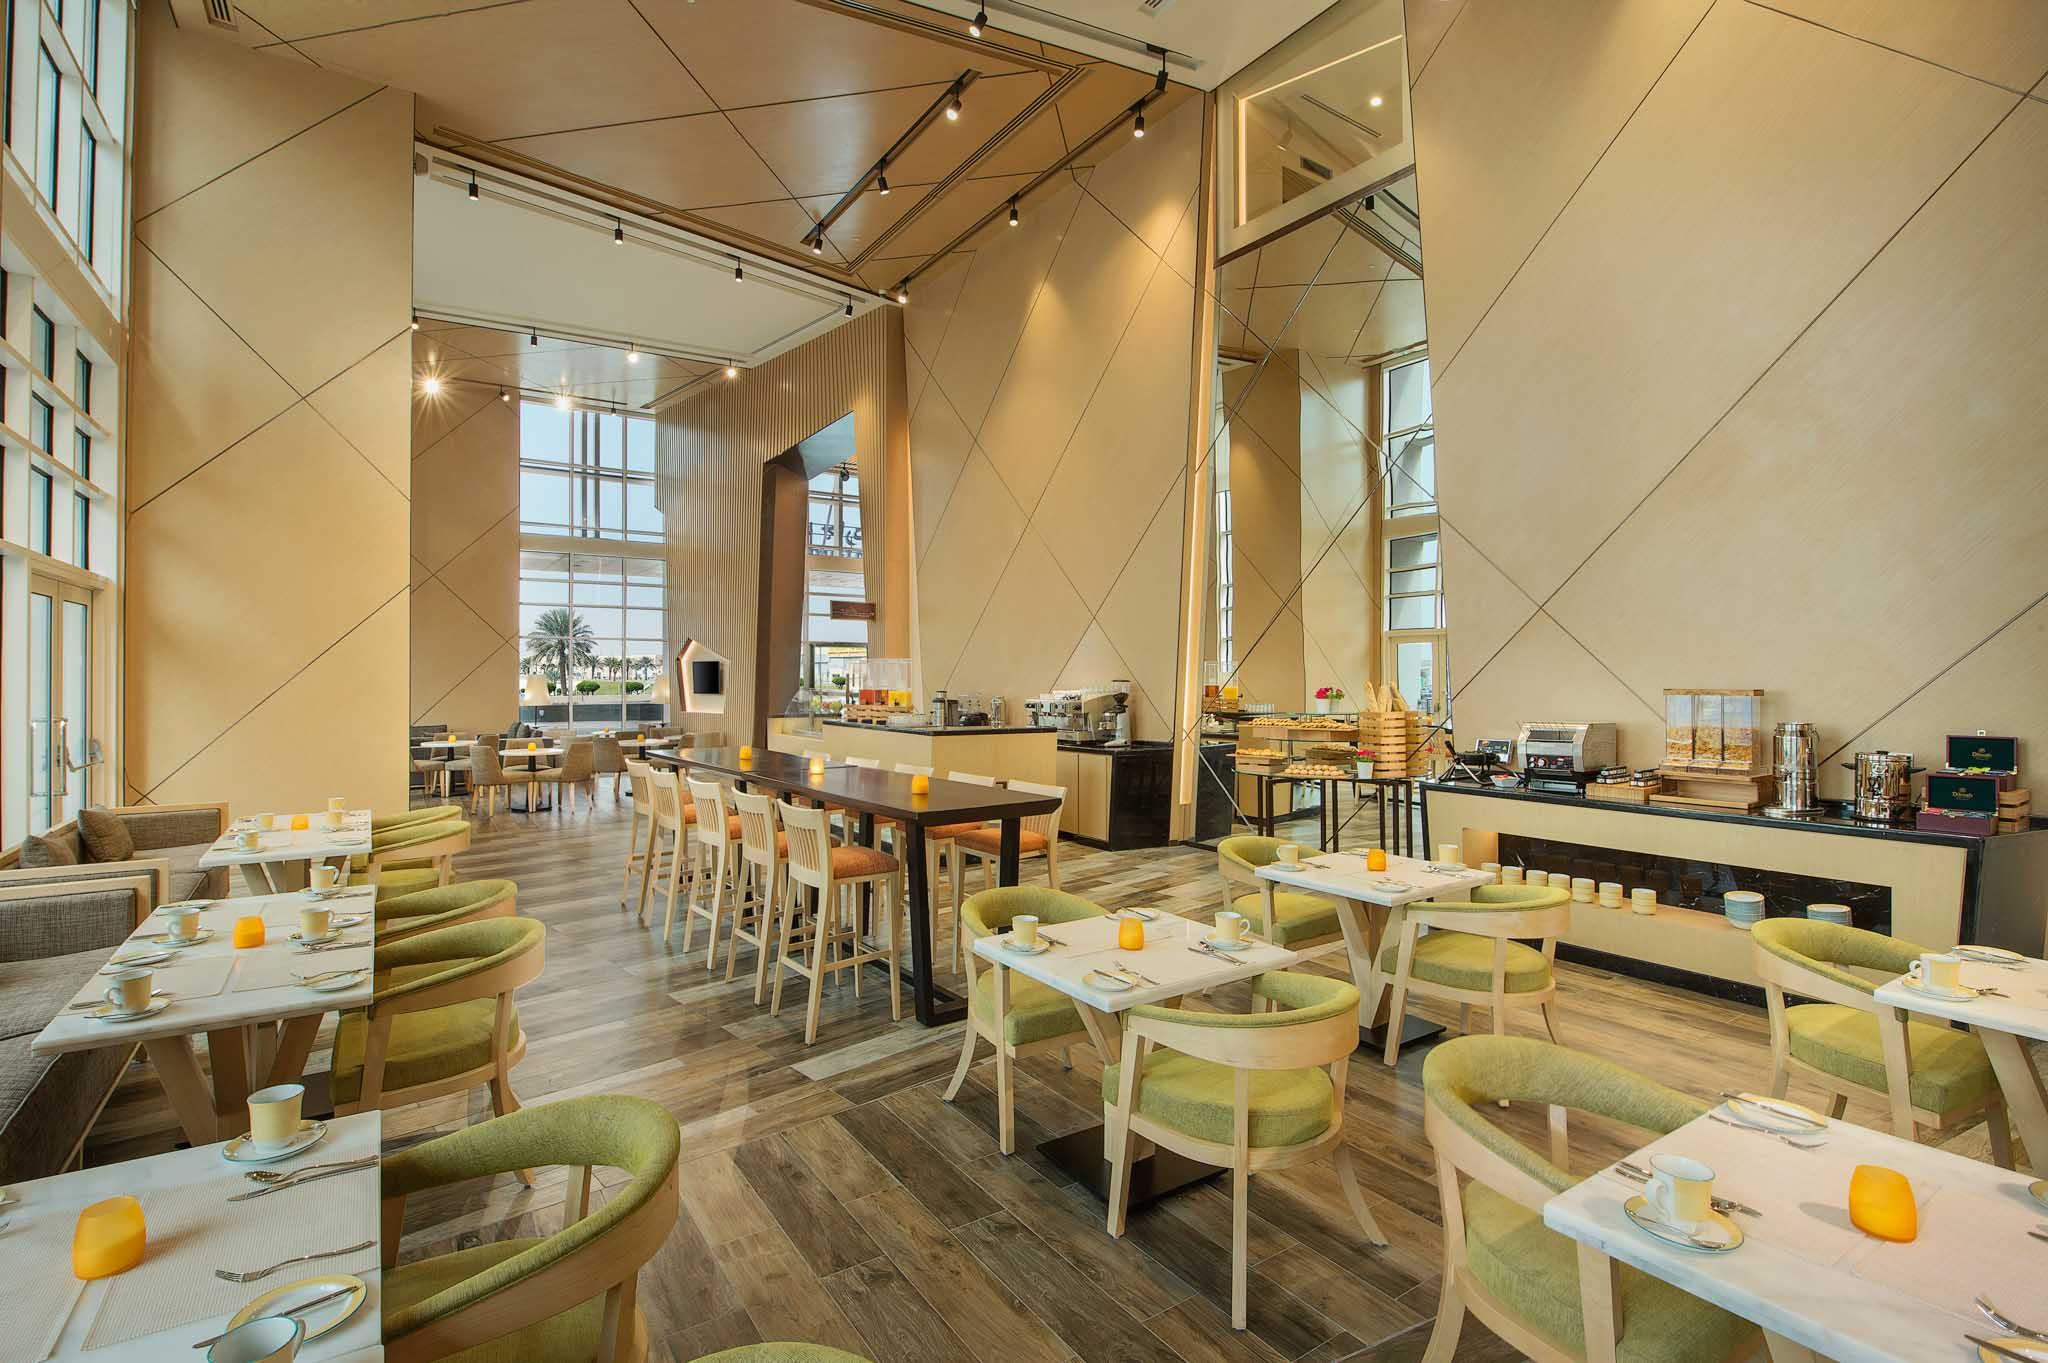 Hotel Photographer - Hilton Garden Inn Dining Al Khobar